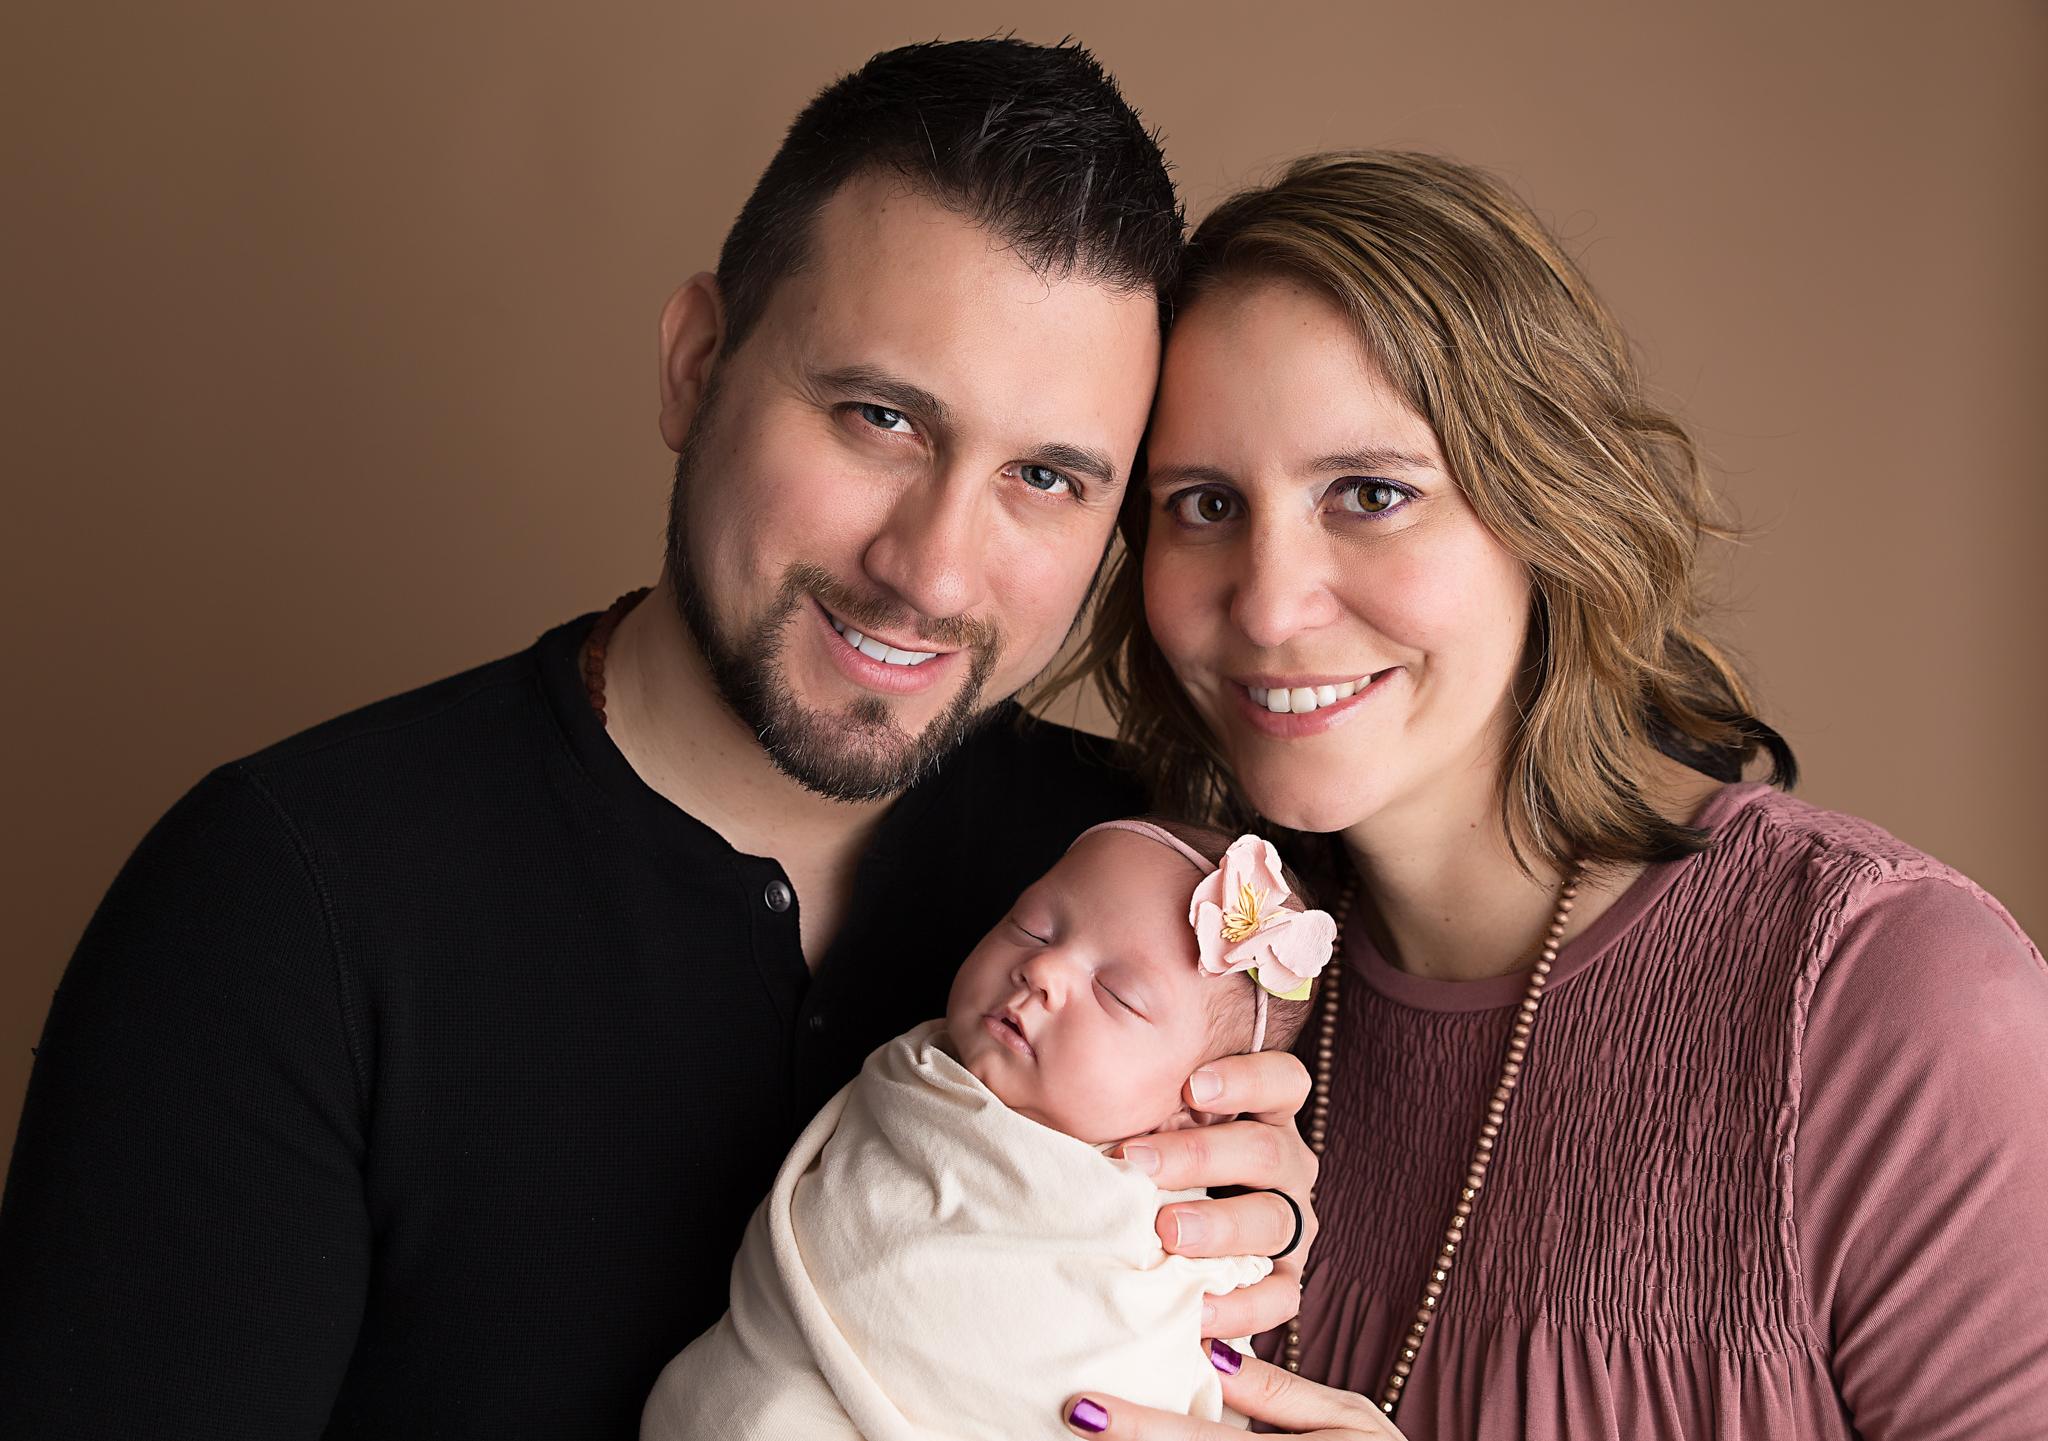 Family newborn session